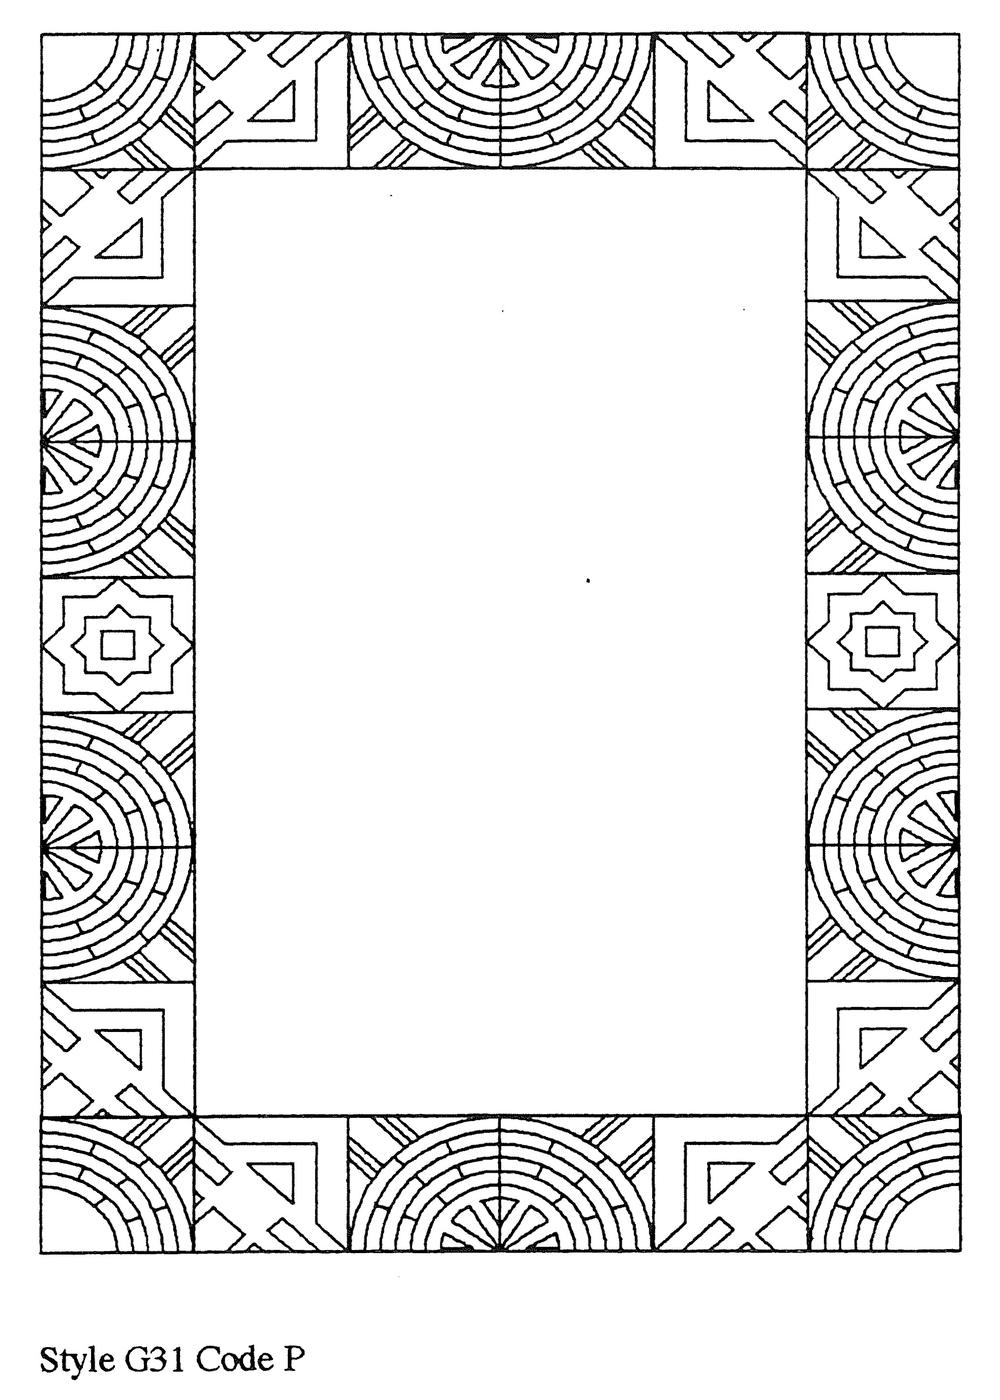 Page 19 copy 2.jpg